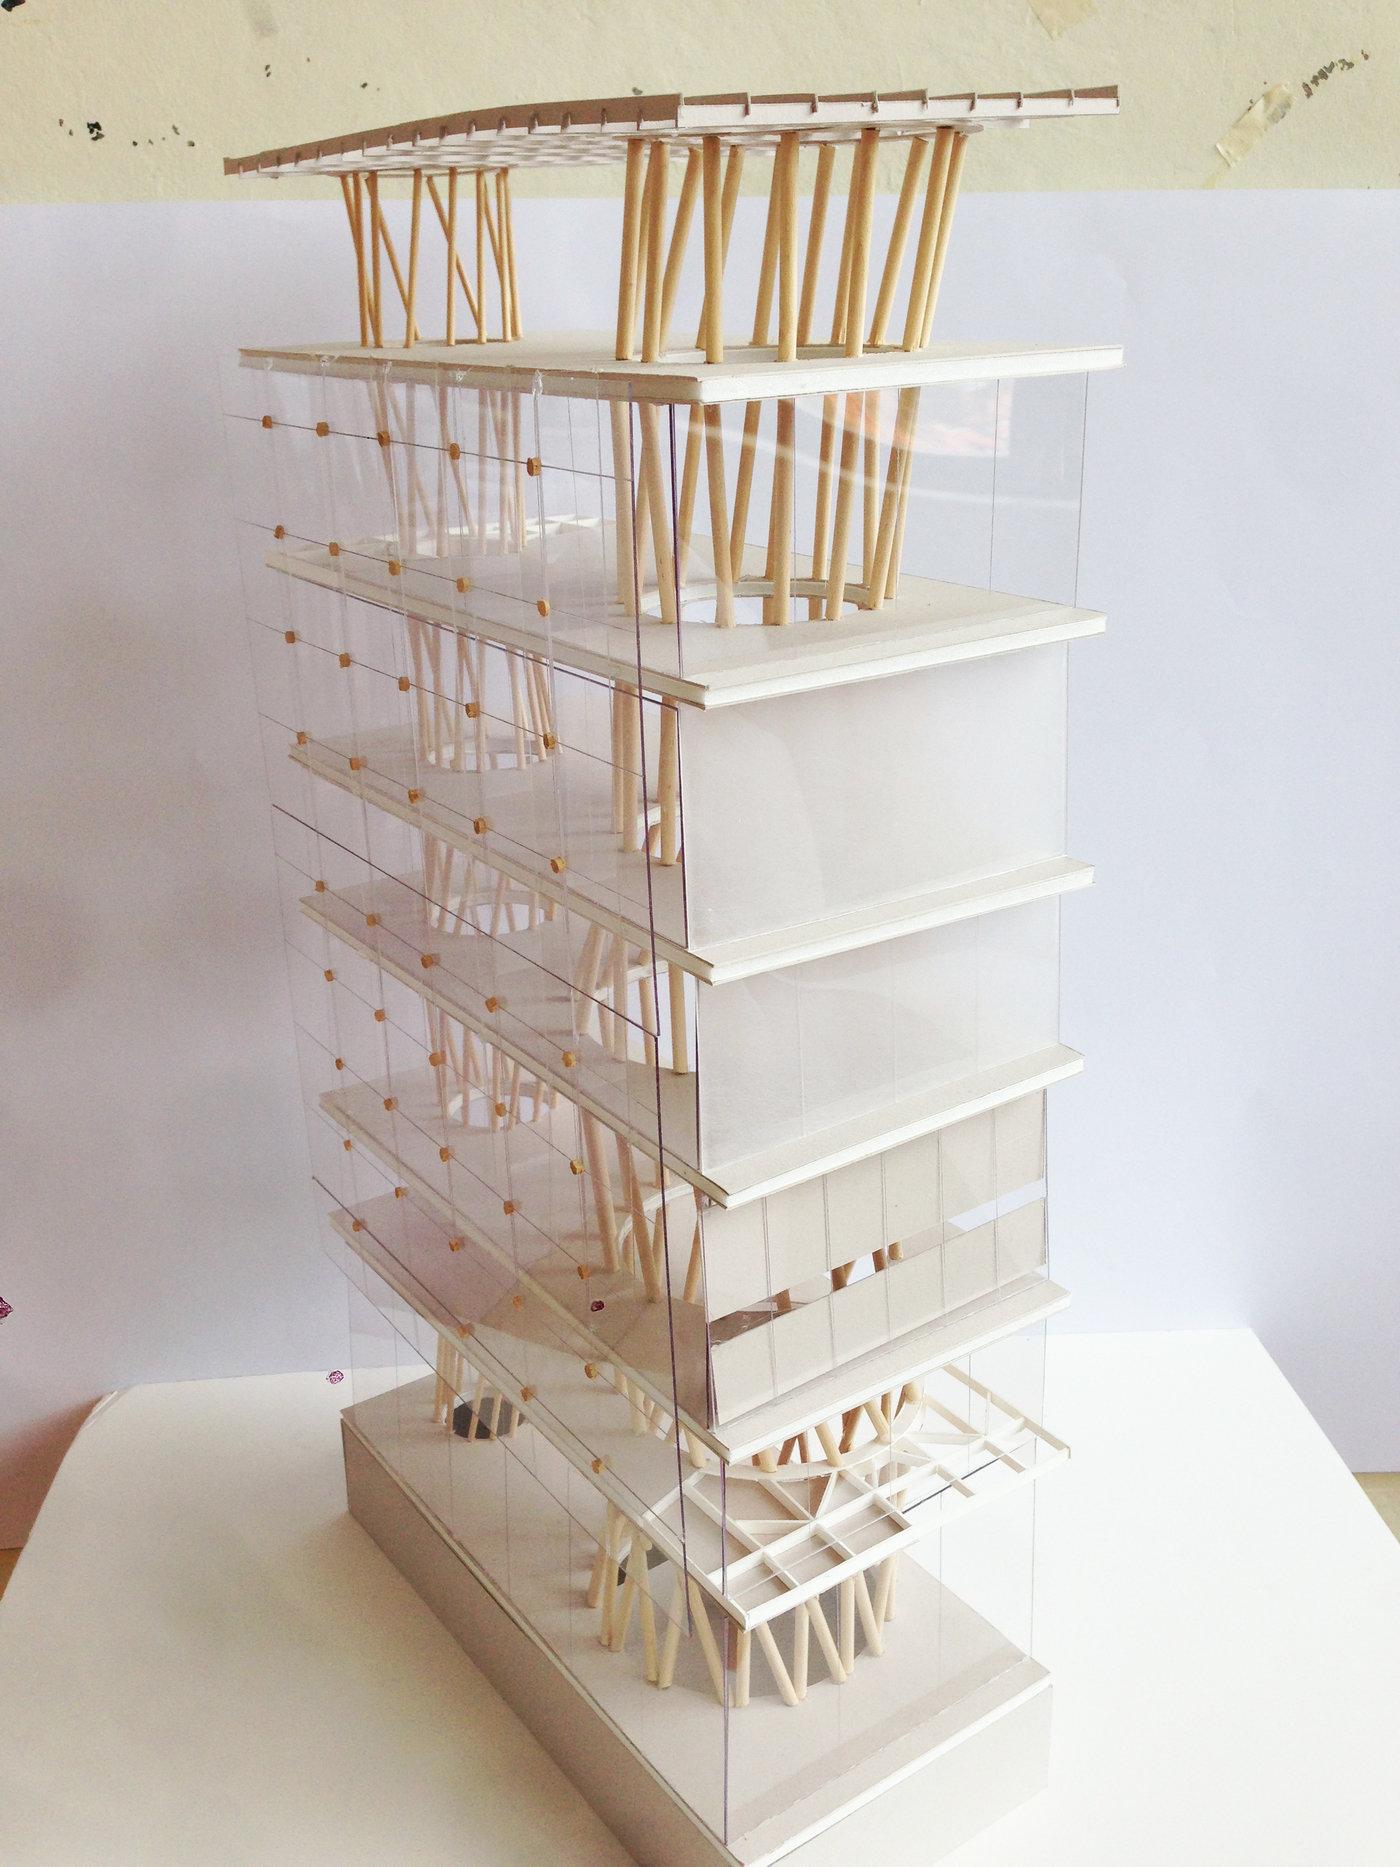 Sendai Mediatheque Physical Model By Alexander Kochman At